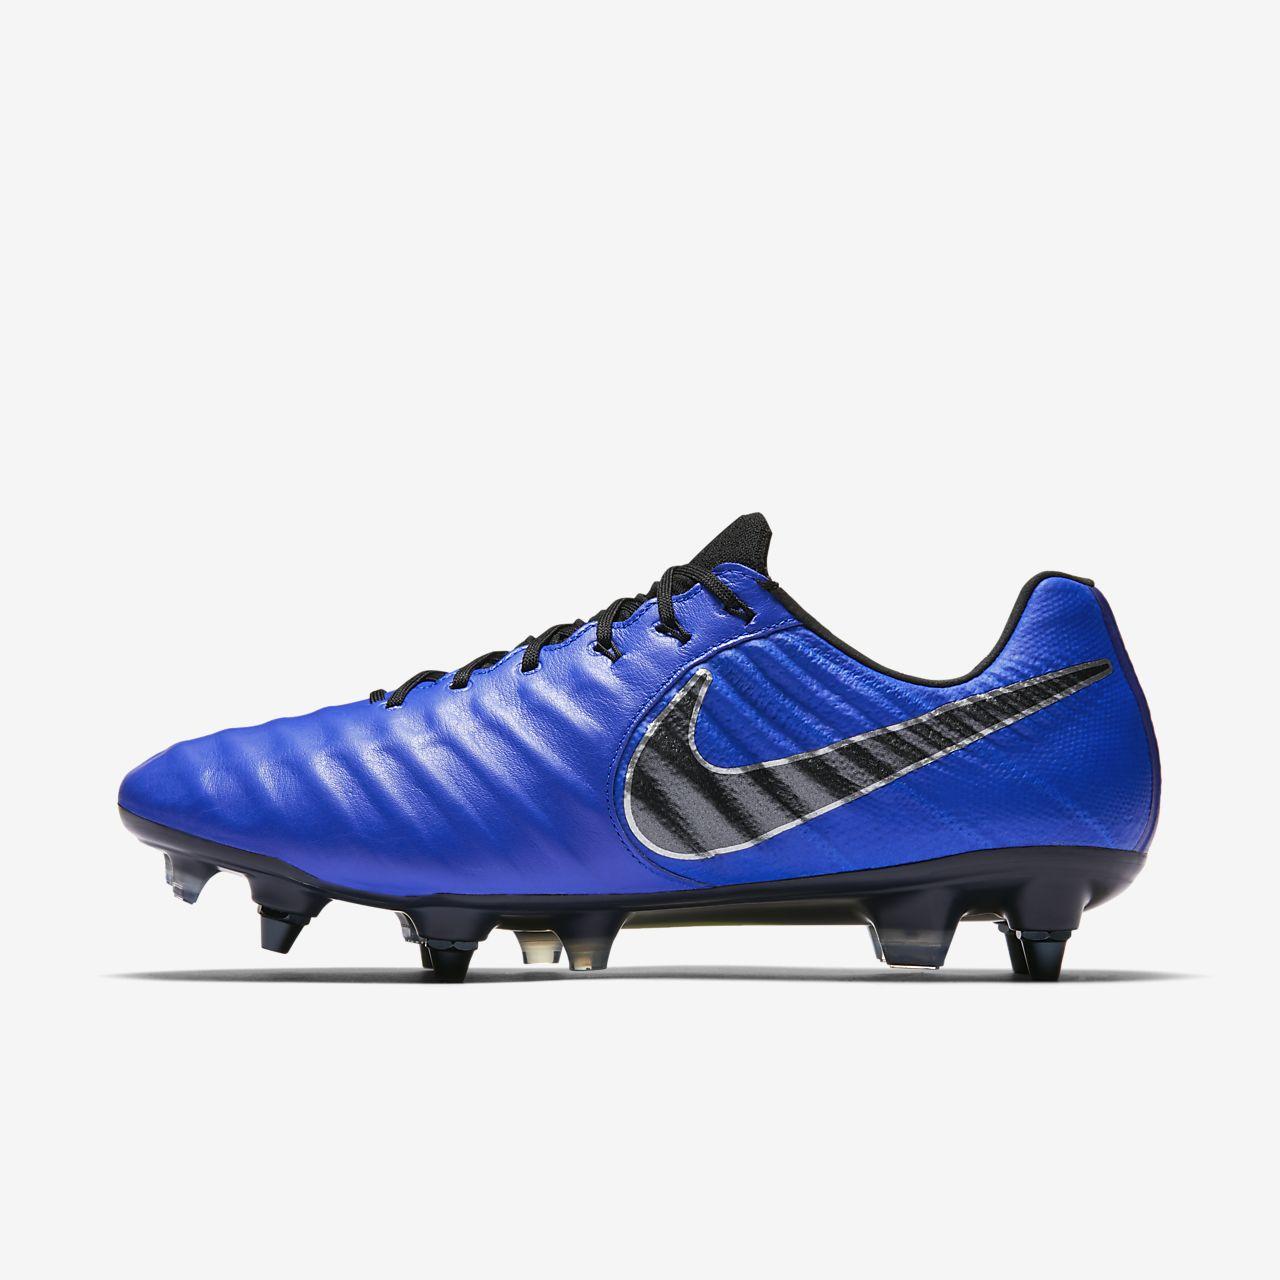 promo code 9658d d6d80 ... closeout calzado de fútbol para terreno blando nike tiempo legend vii  elite sg pro anti 2ea70 ...